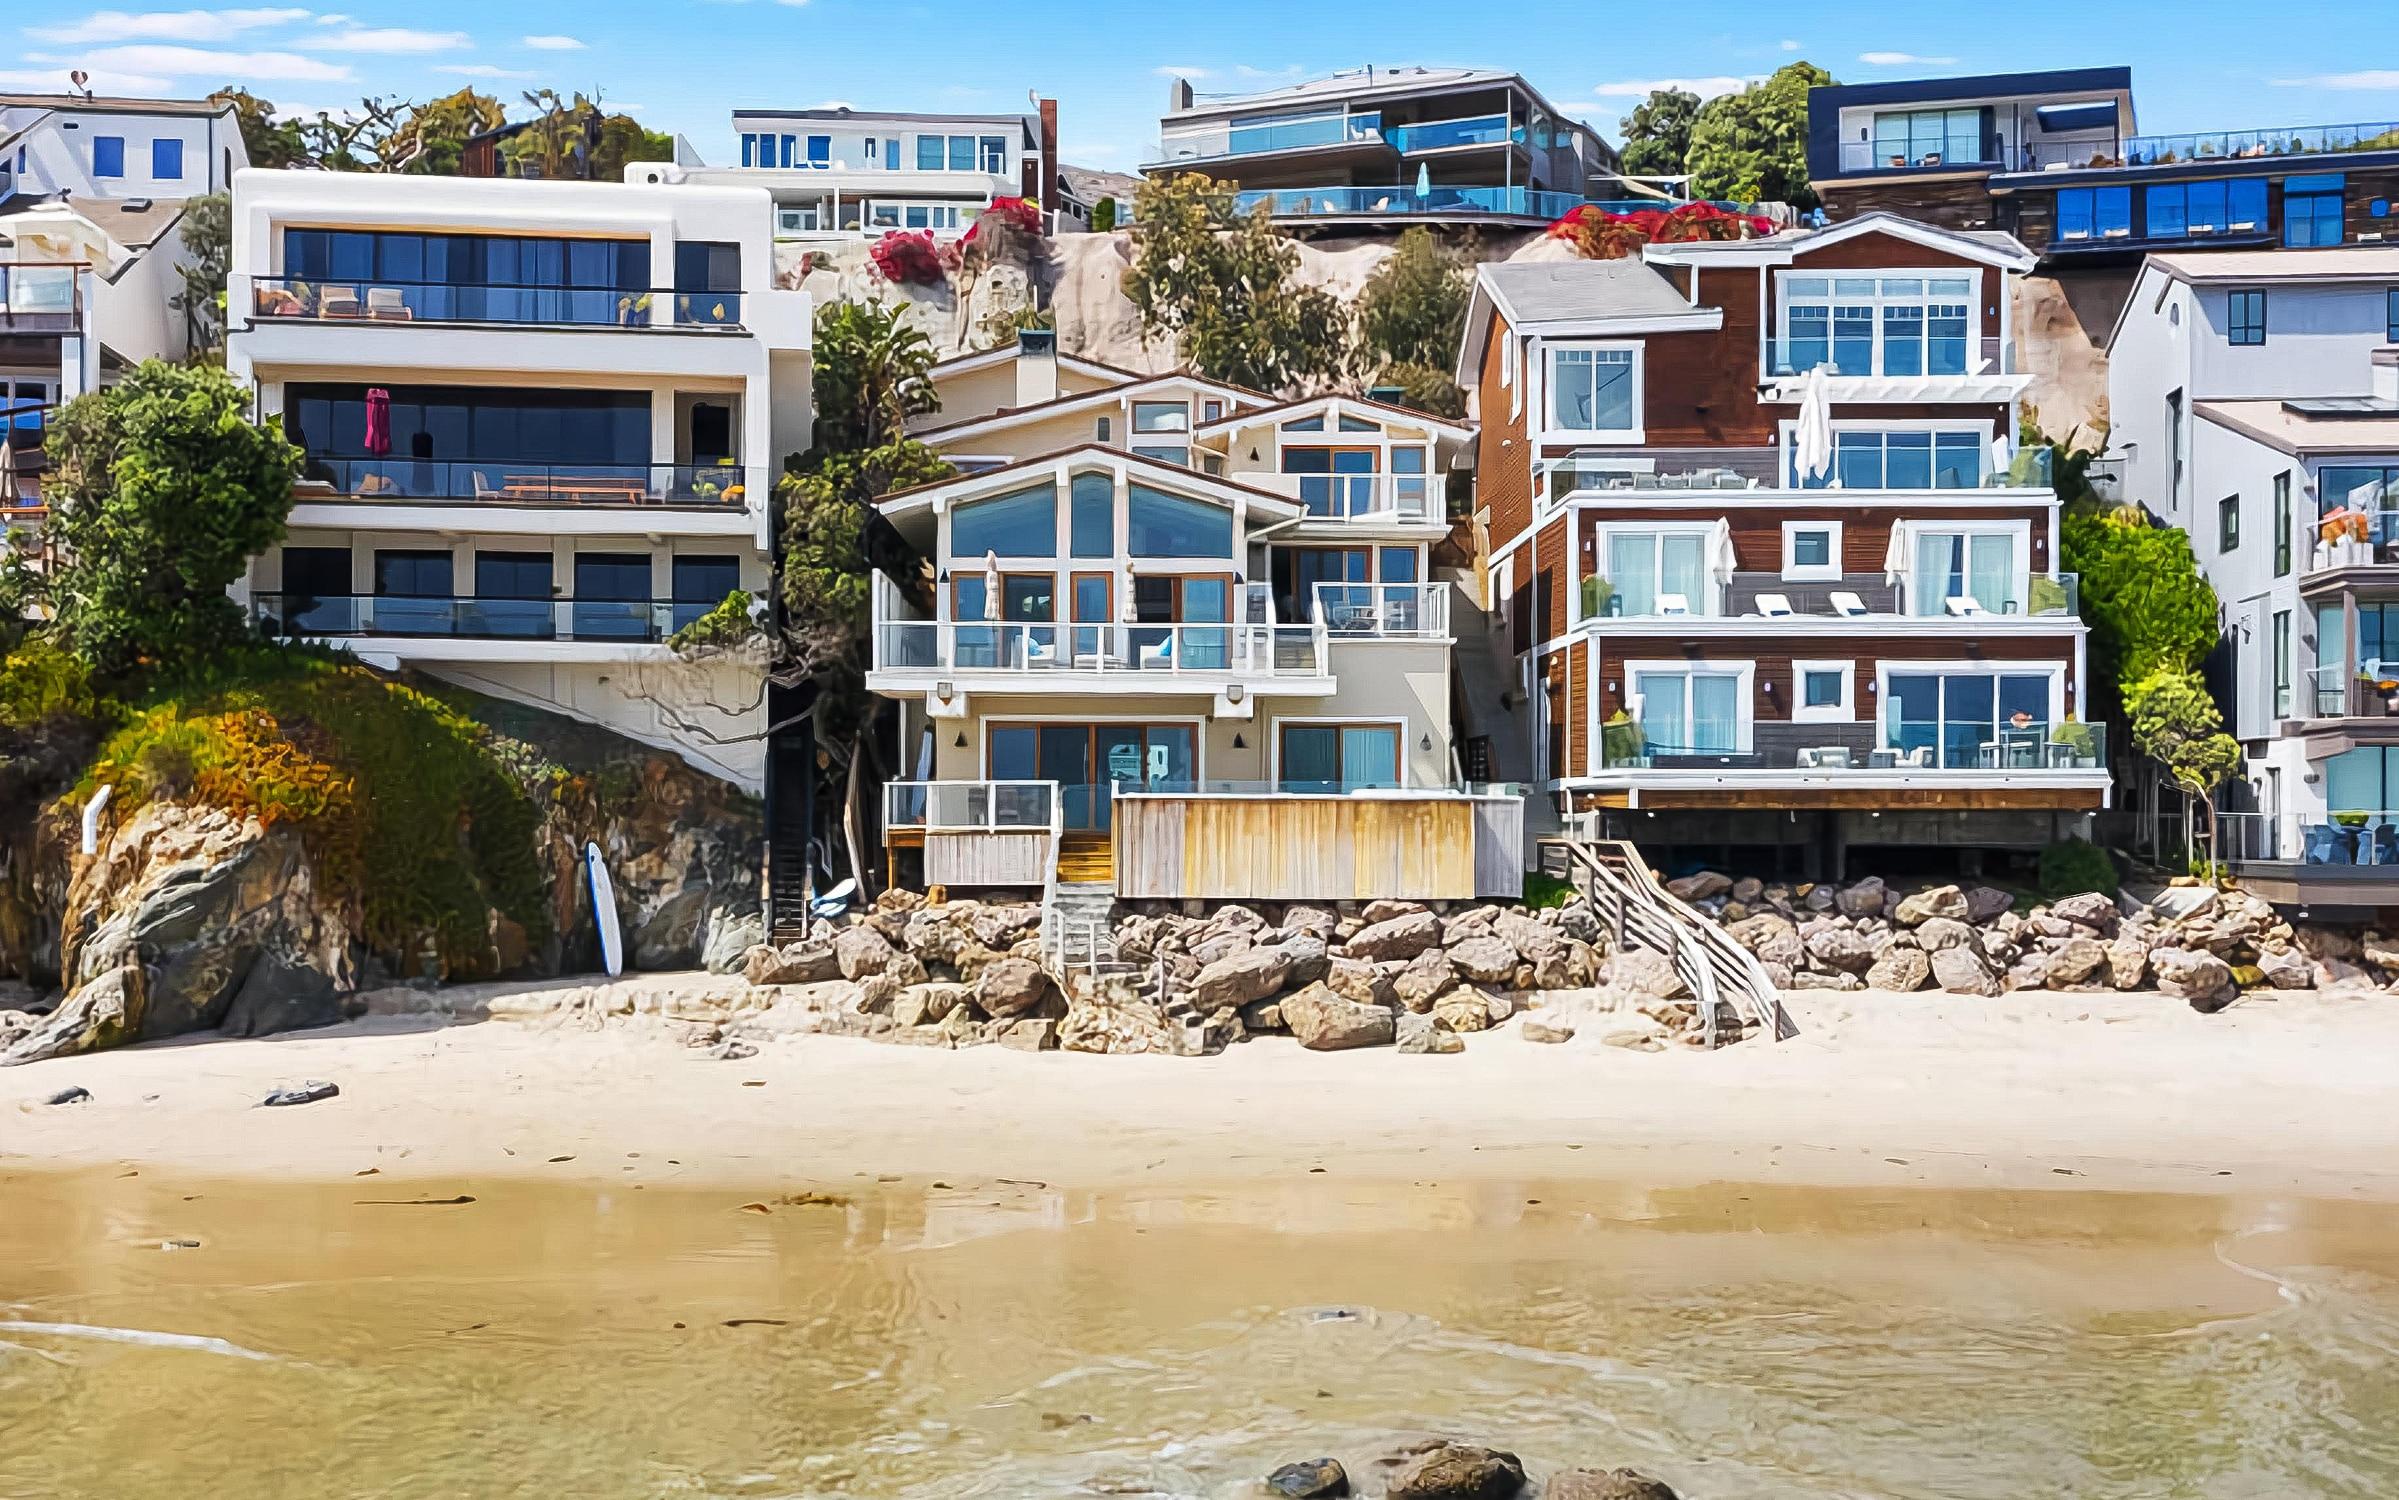 Steve McQueen's Malibu Beach House